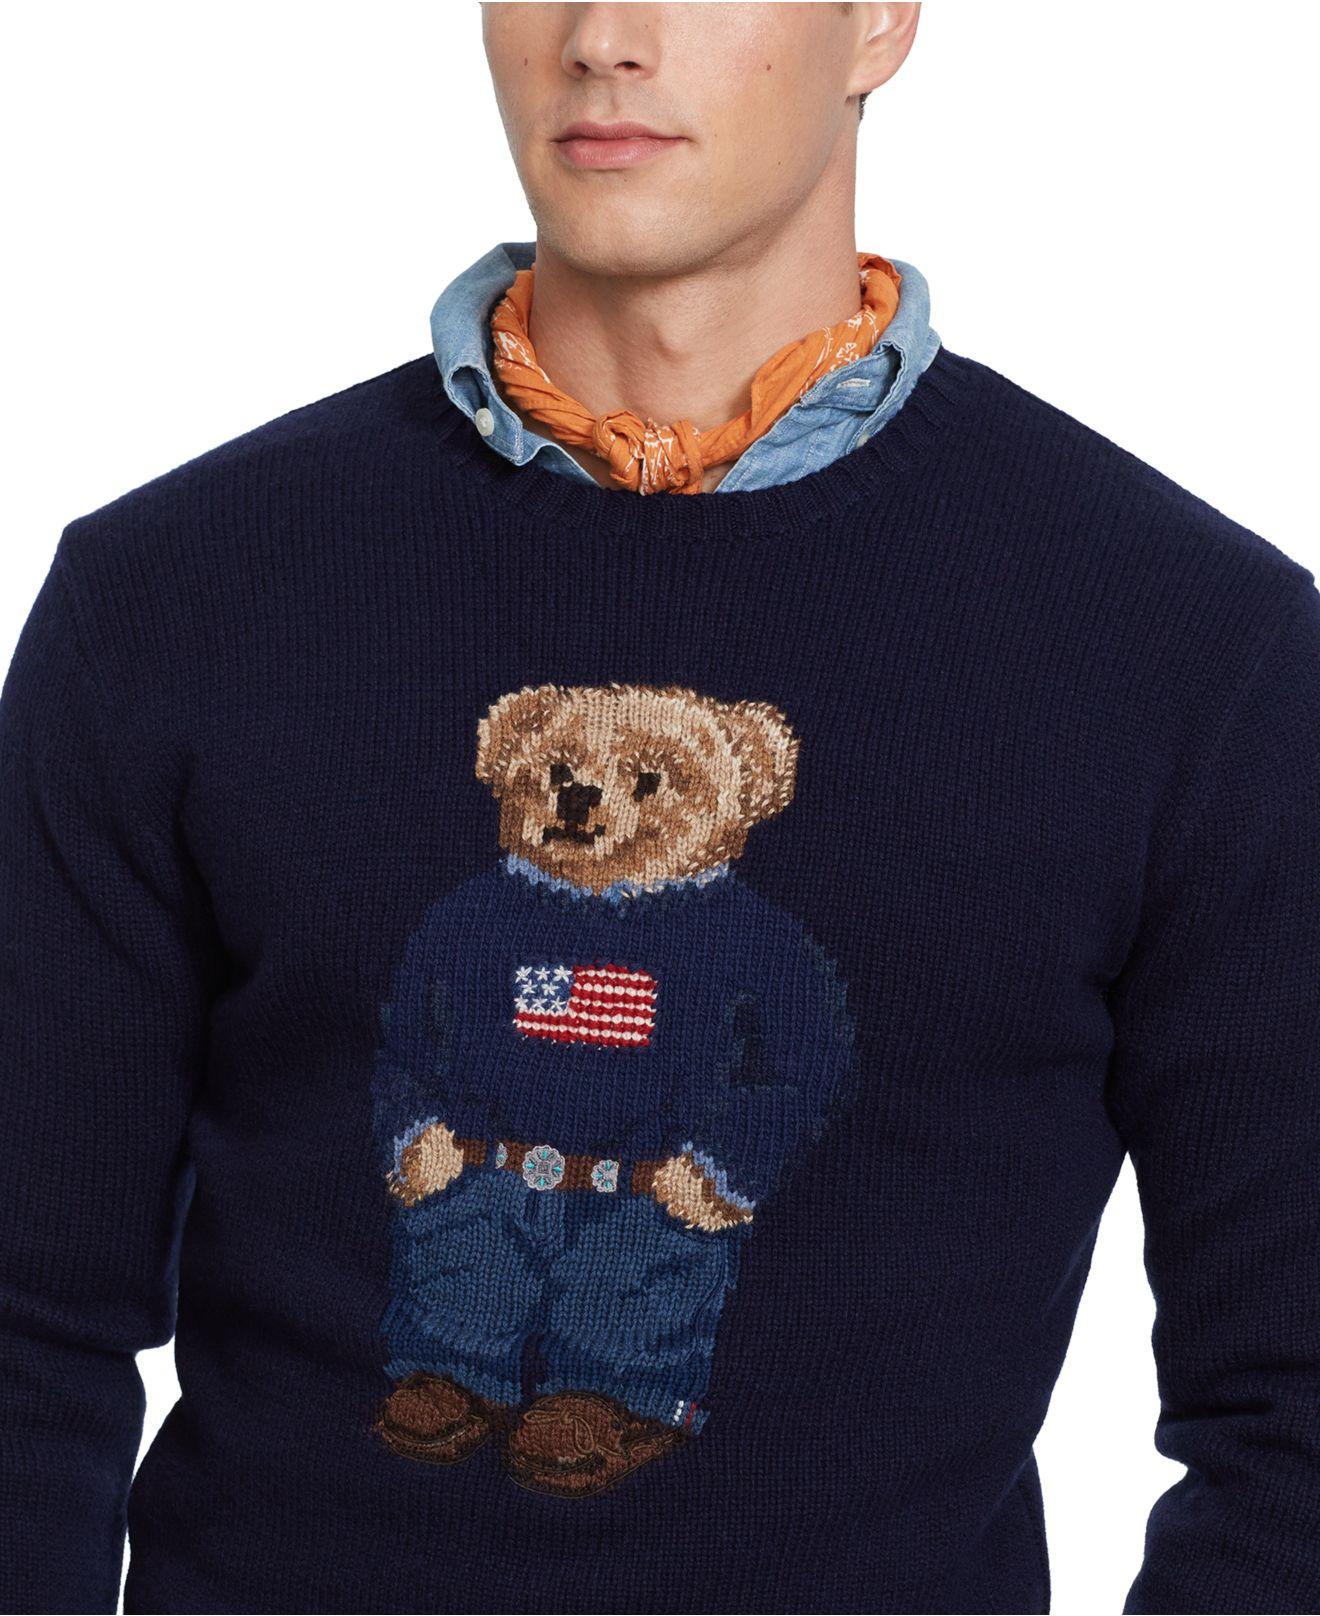 dbb13101b Lyst - Polo Ralph Lauren Polo Bear Wool Sweater in Blue for Men